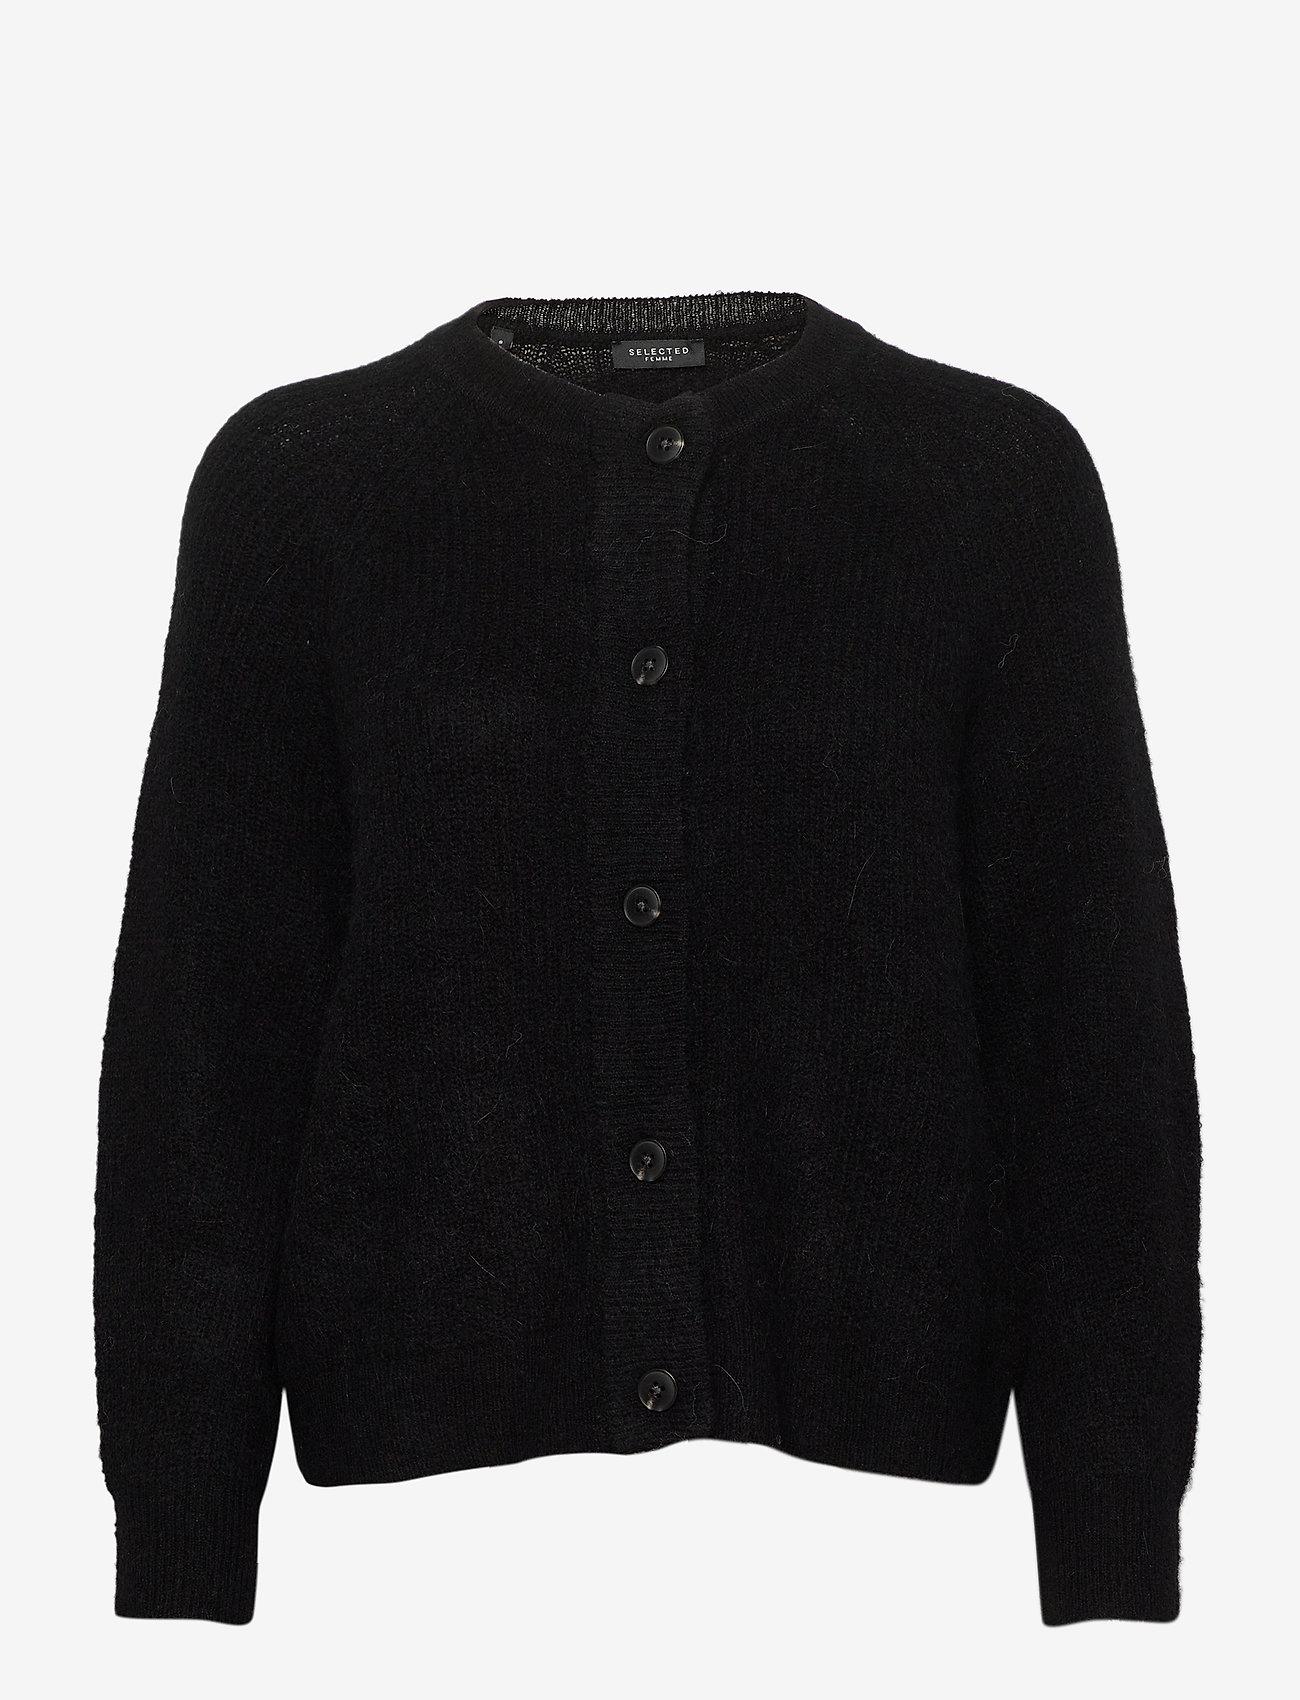 Selected Femme - SLFLULU LS KNIT SHORT CARDIGAN - cardigans - black - 0